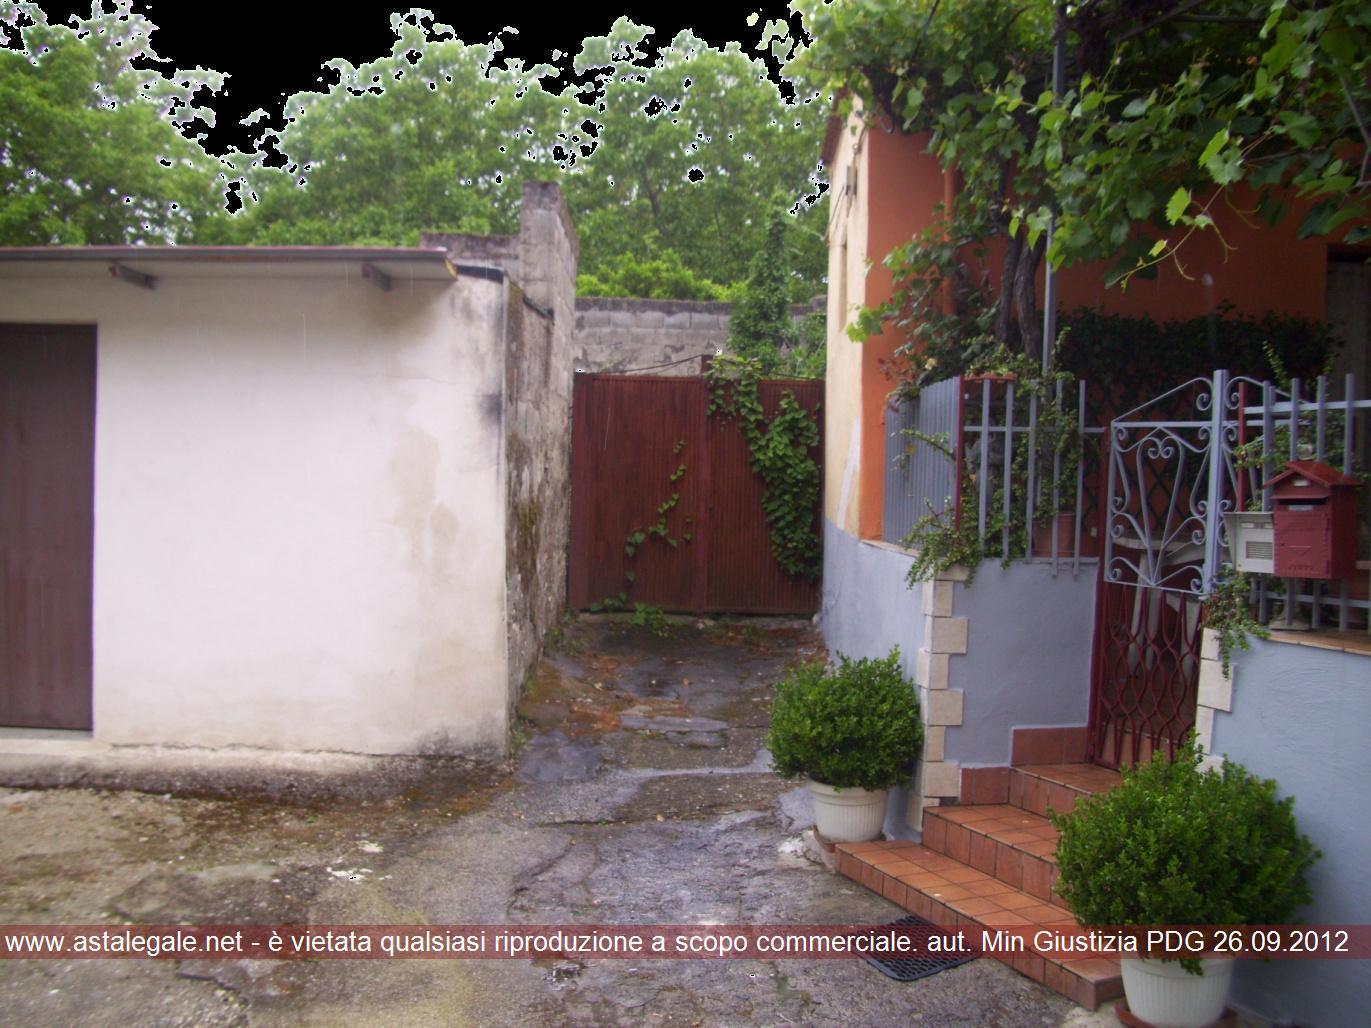 Pago Del Vallo Di Lauro (AV) Via Santolo Rega 15